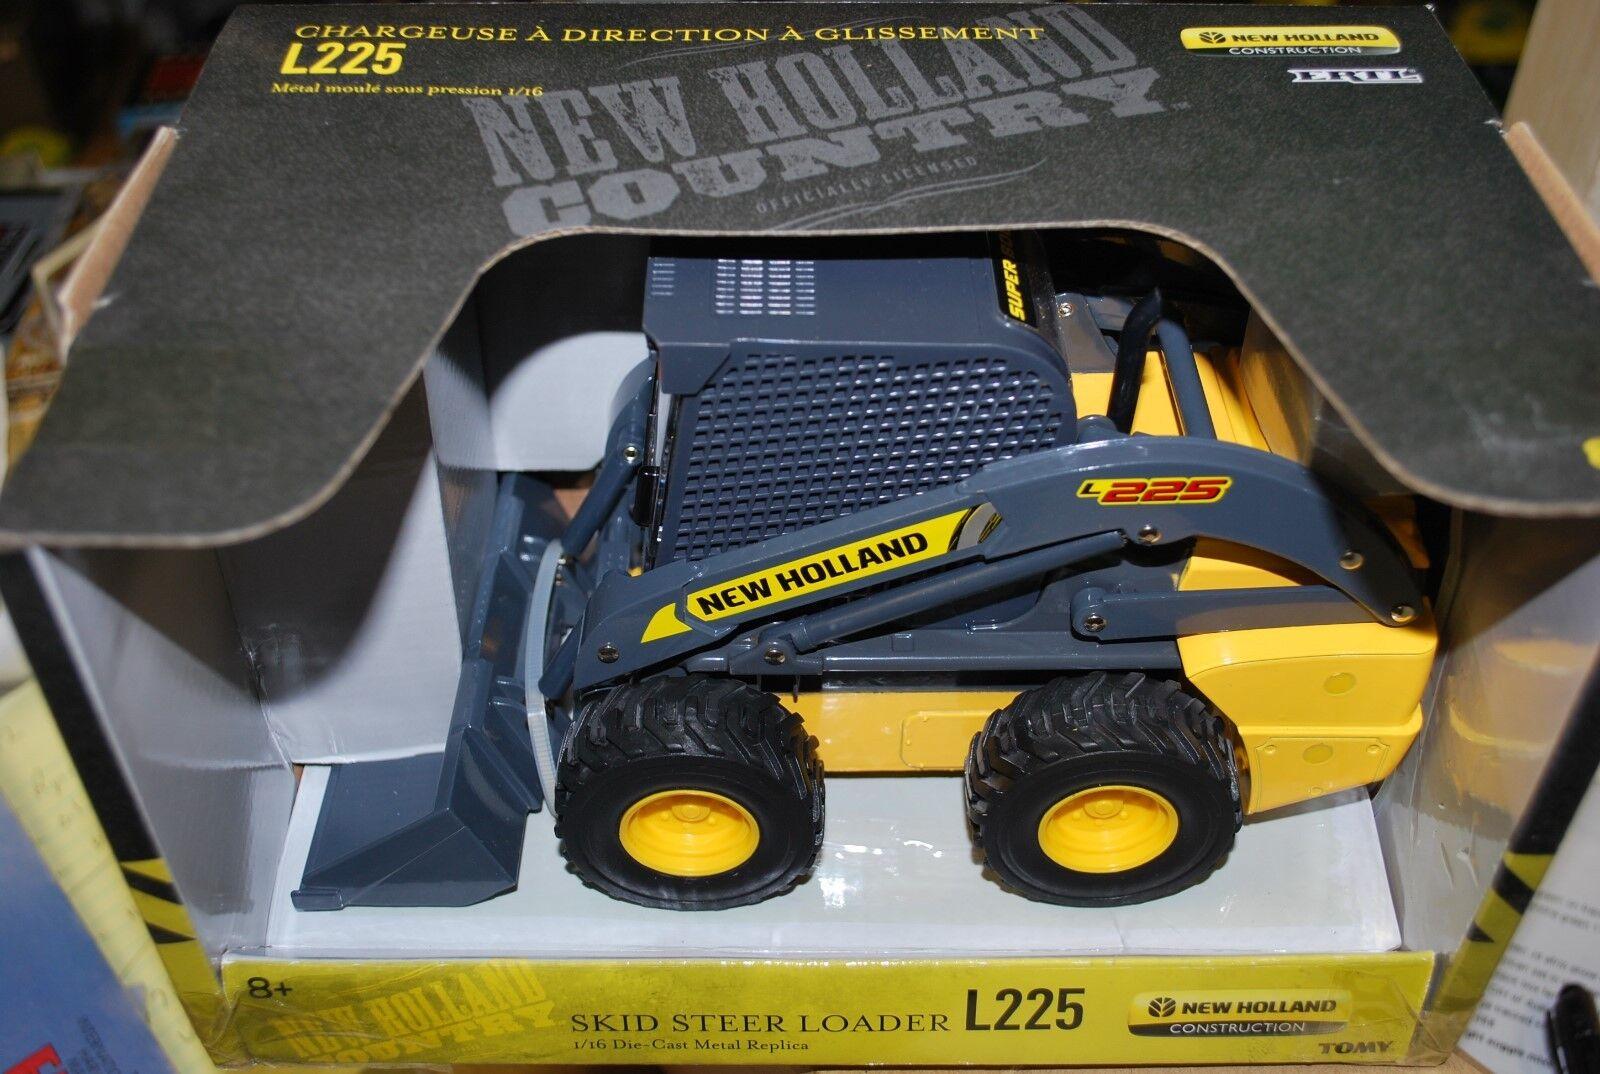 1 16 New Holland L225 skid steer loader, Ertl, new in box